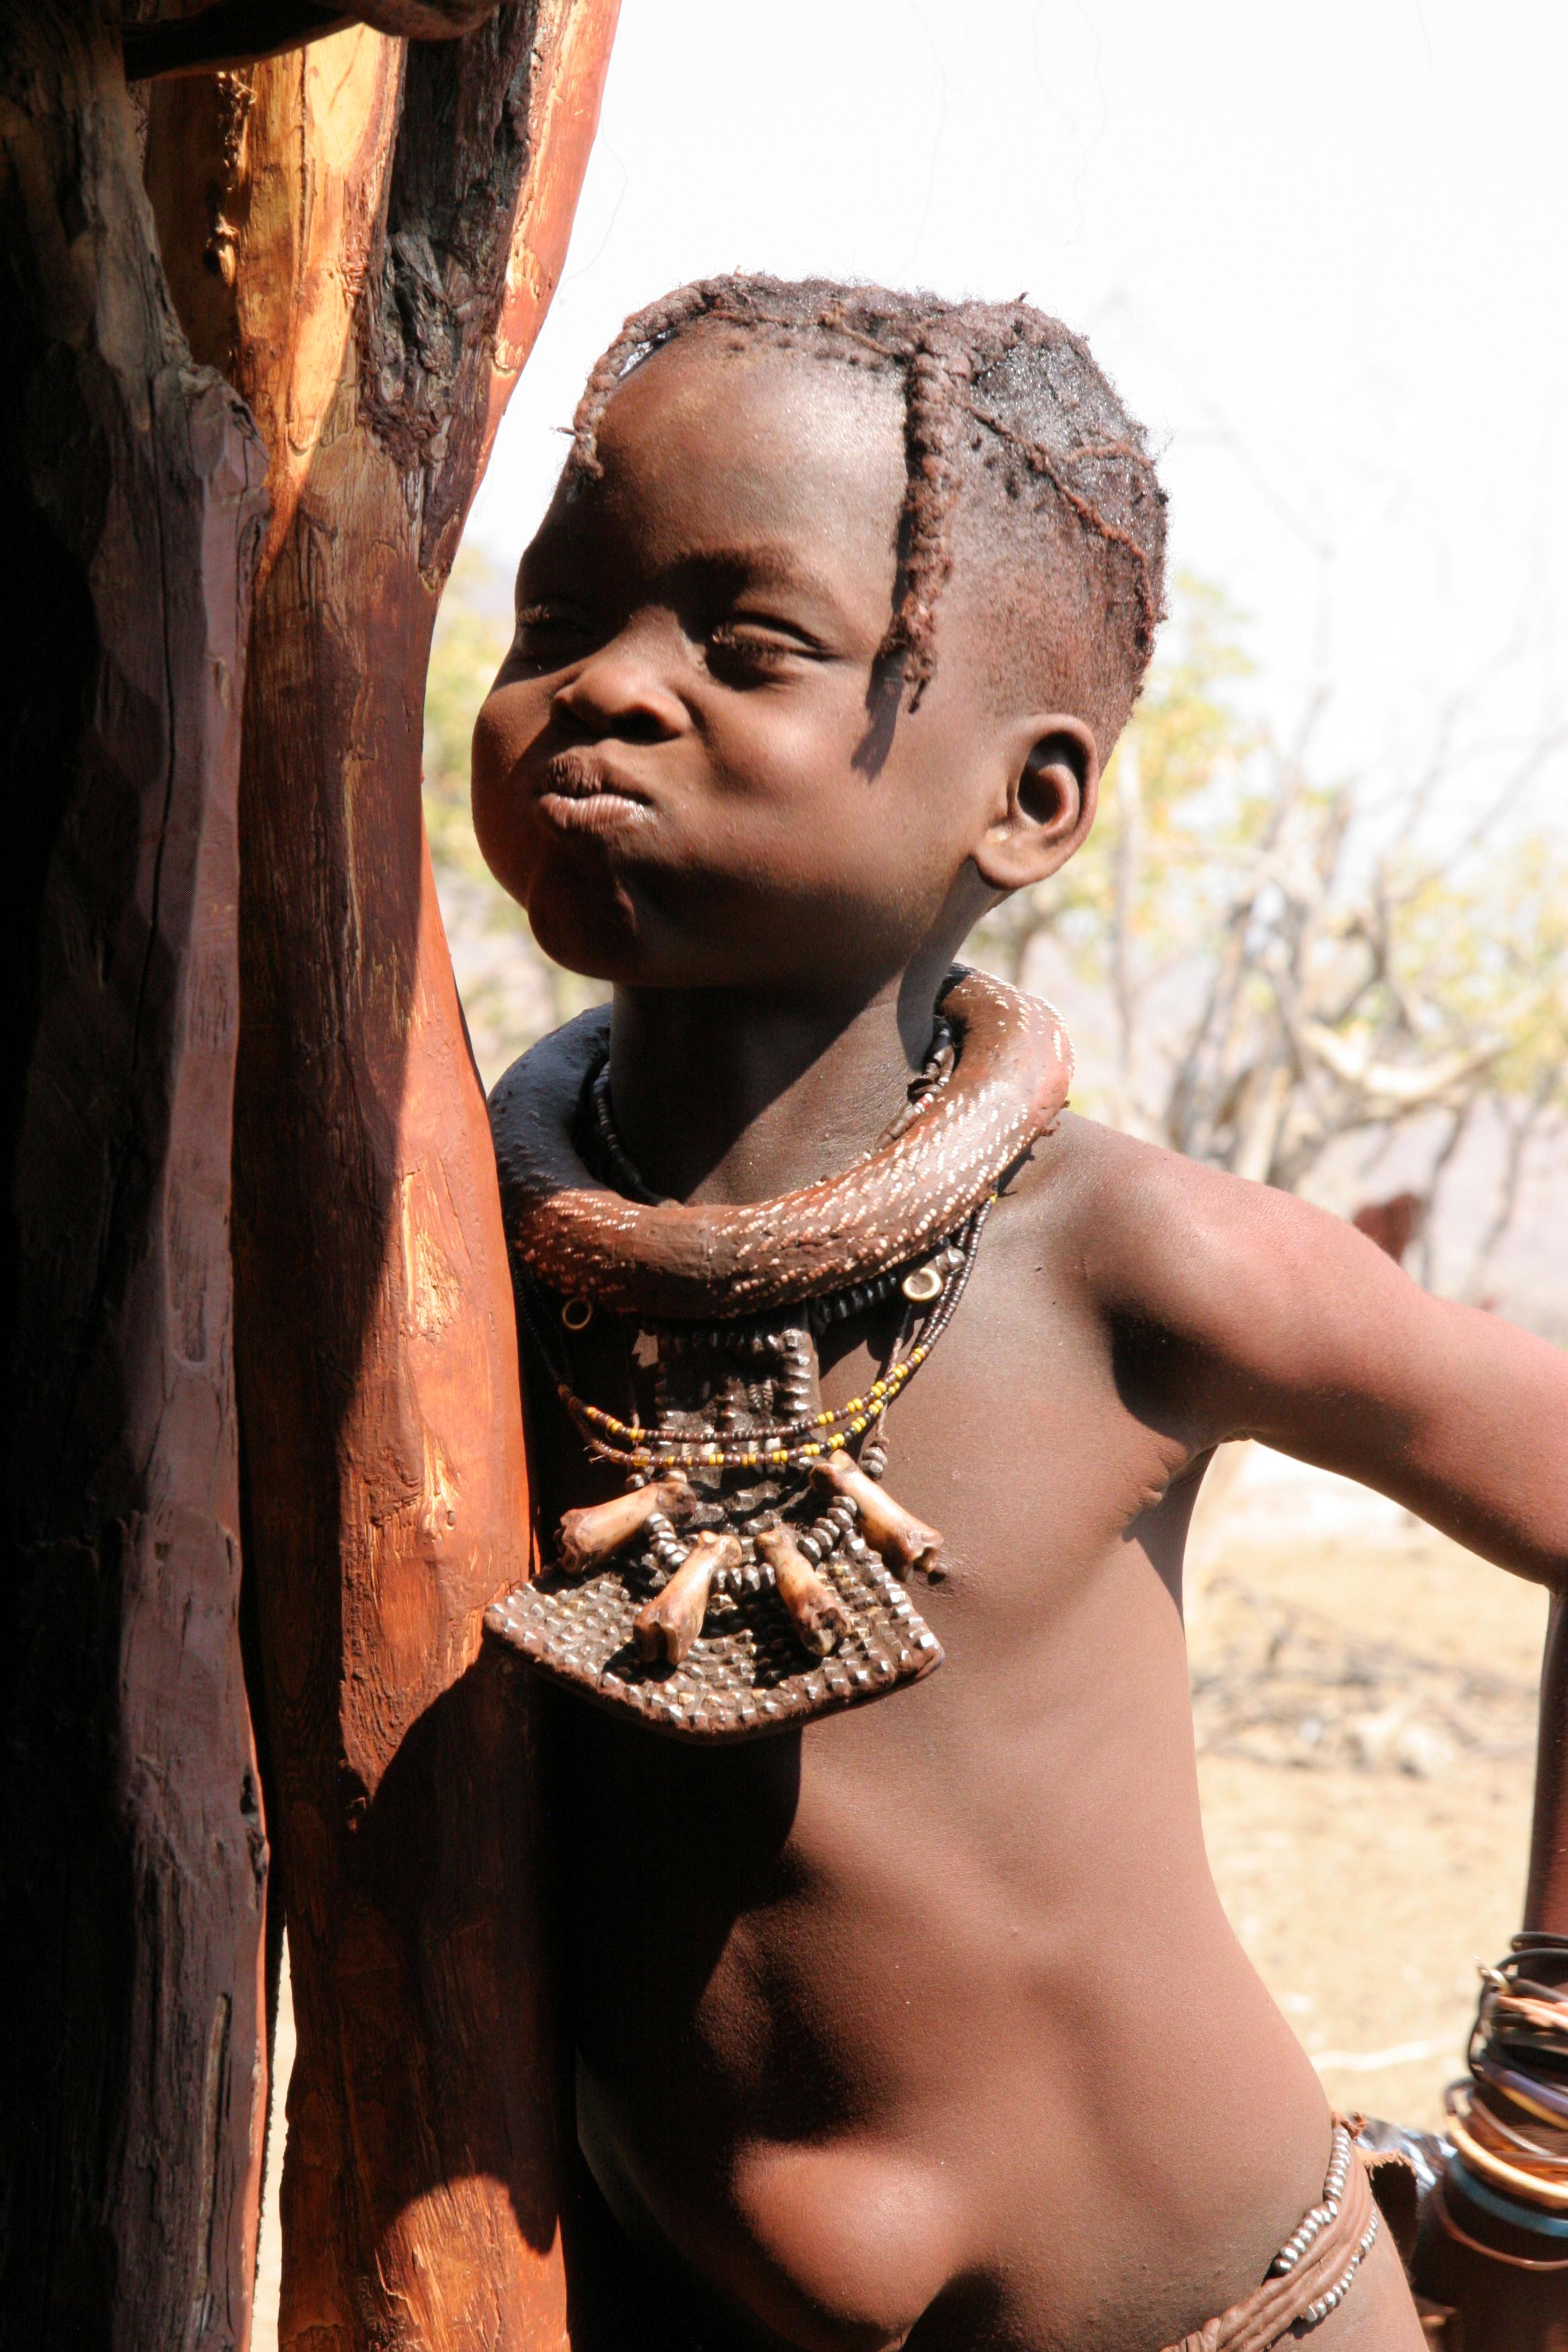 african himba women xxxsex free download